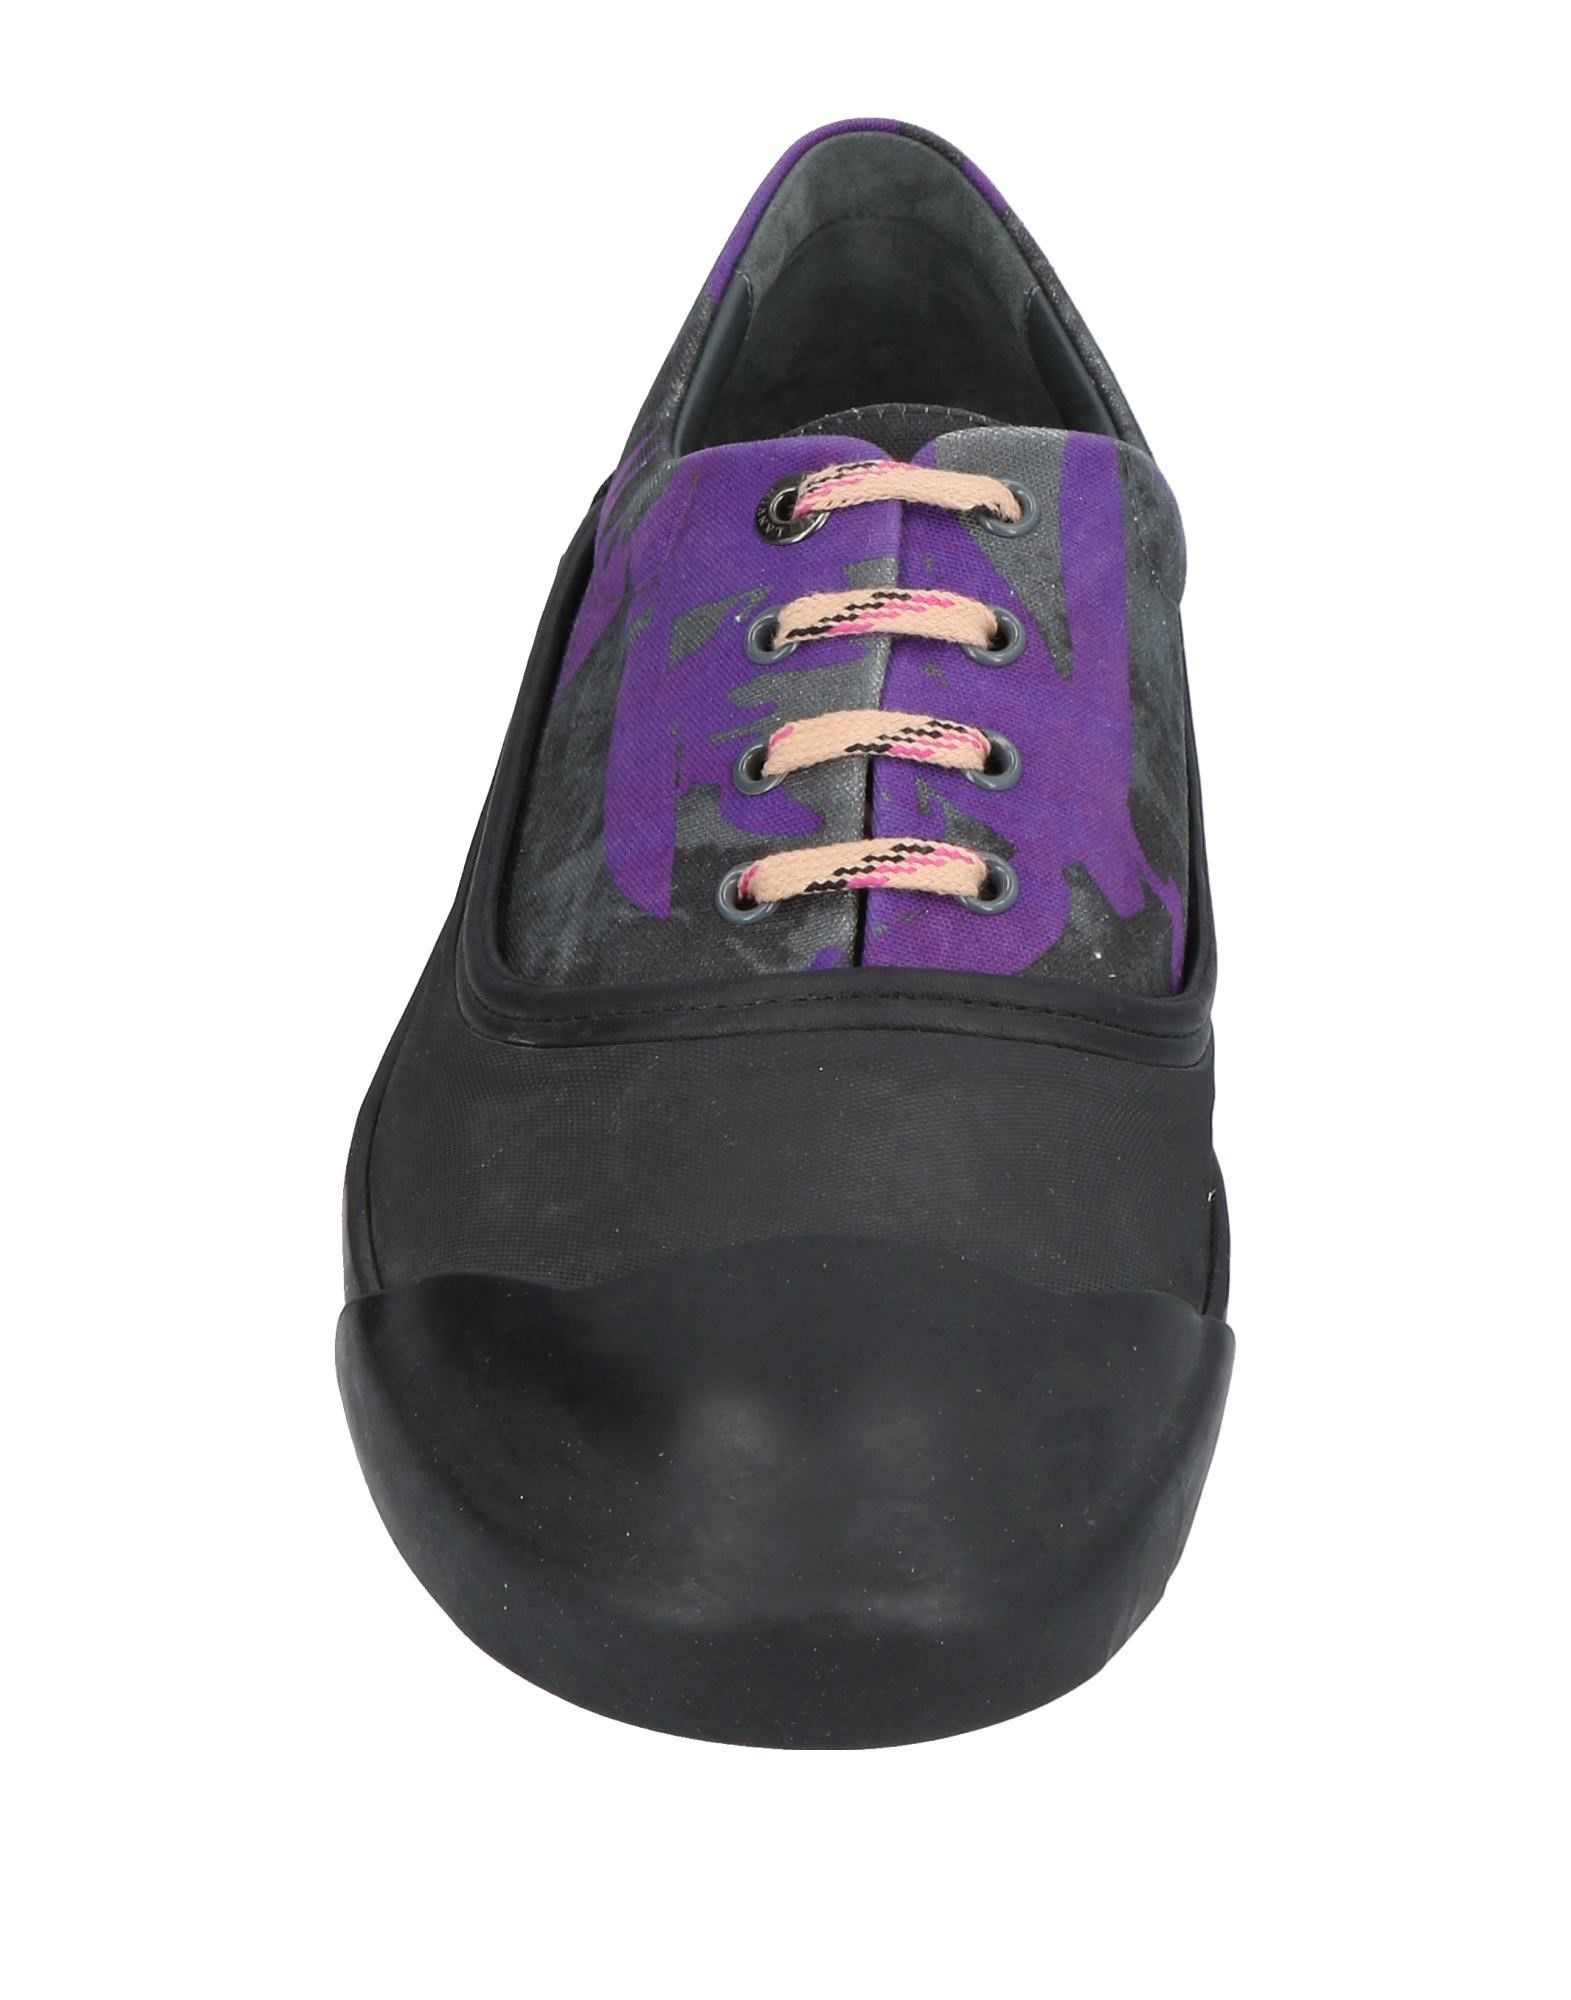 Lanvin Gute Sneakers Herren  11327378UP Gute Lanvin Qualität beliebte Schuhe ce43a7